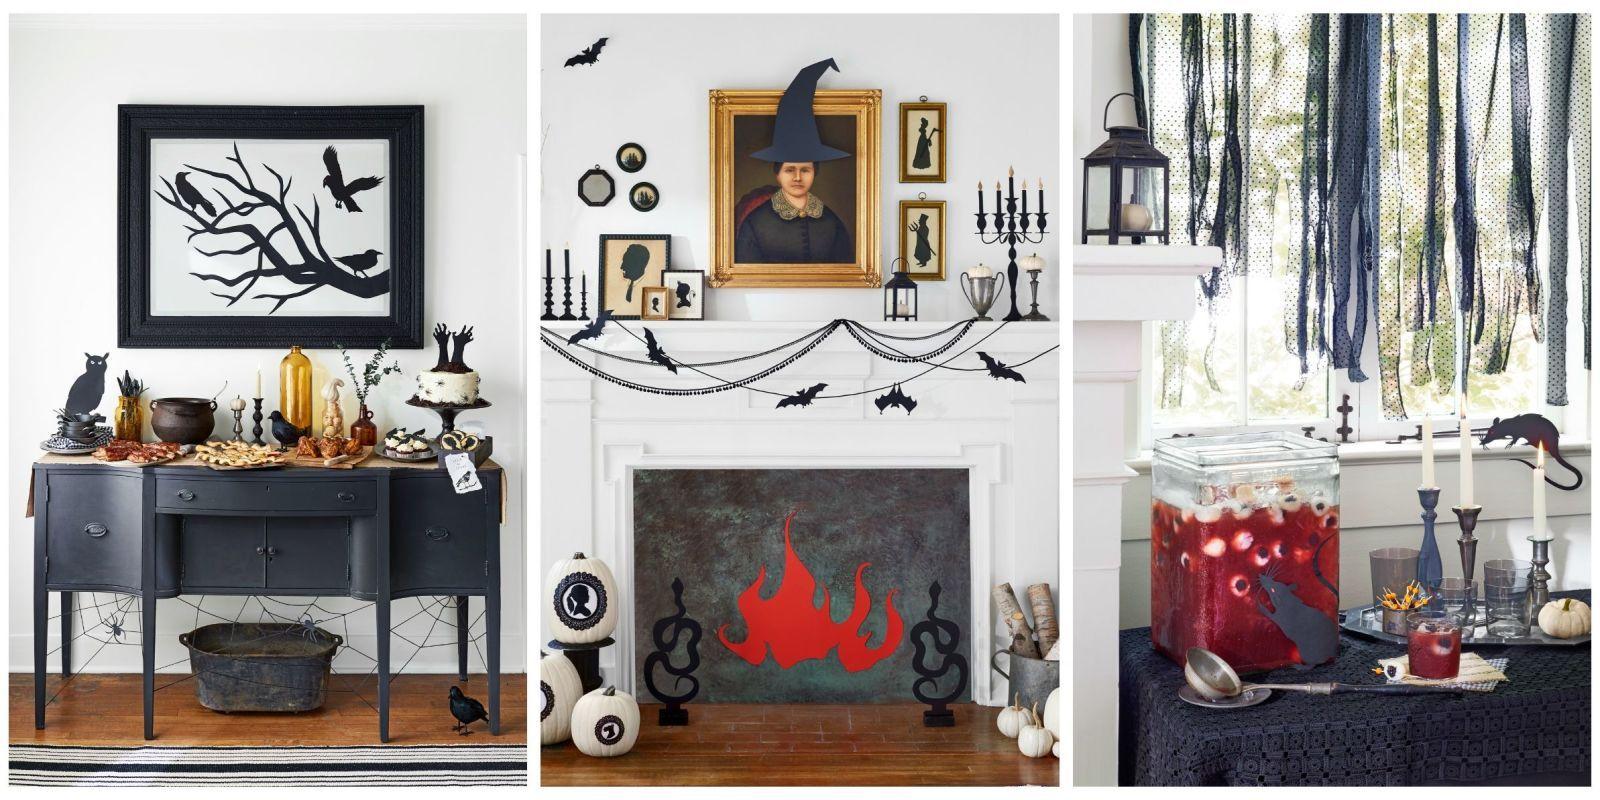 45 Fun and Festive Halloween Party Decoration Ideas | Pinterest ...